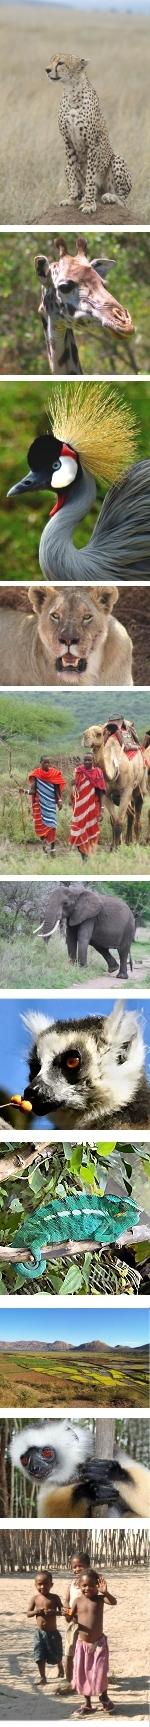 Kenya and Madagascar enticing combination